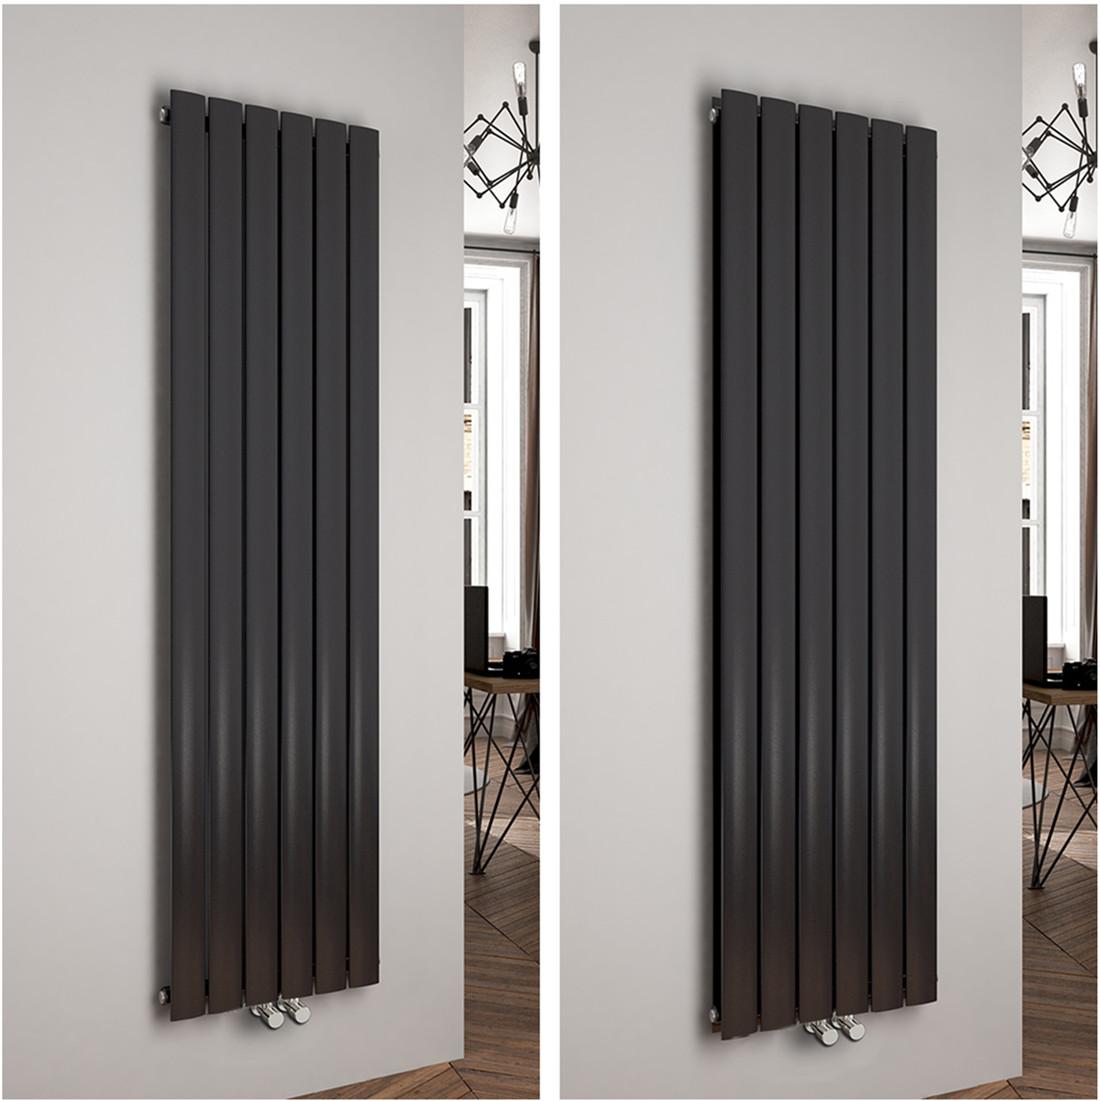 flach heizk rper paneelheizk rper vertikal badheizk rper. Black Bedroom Furniture Sets. Home Design Ideas